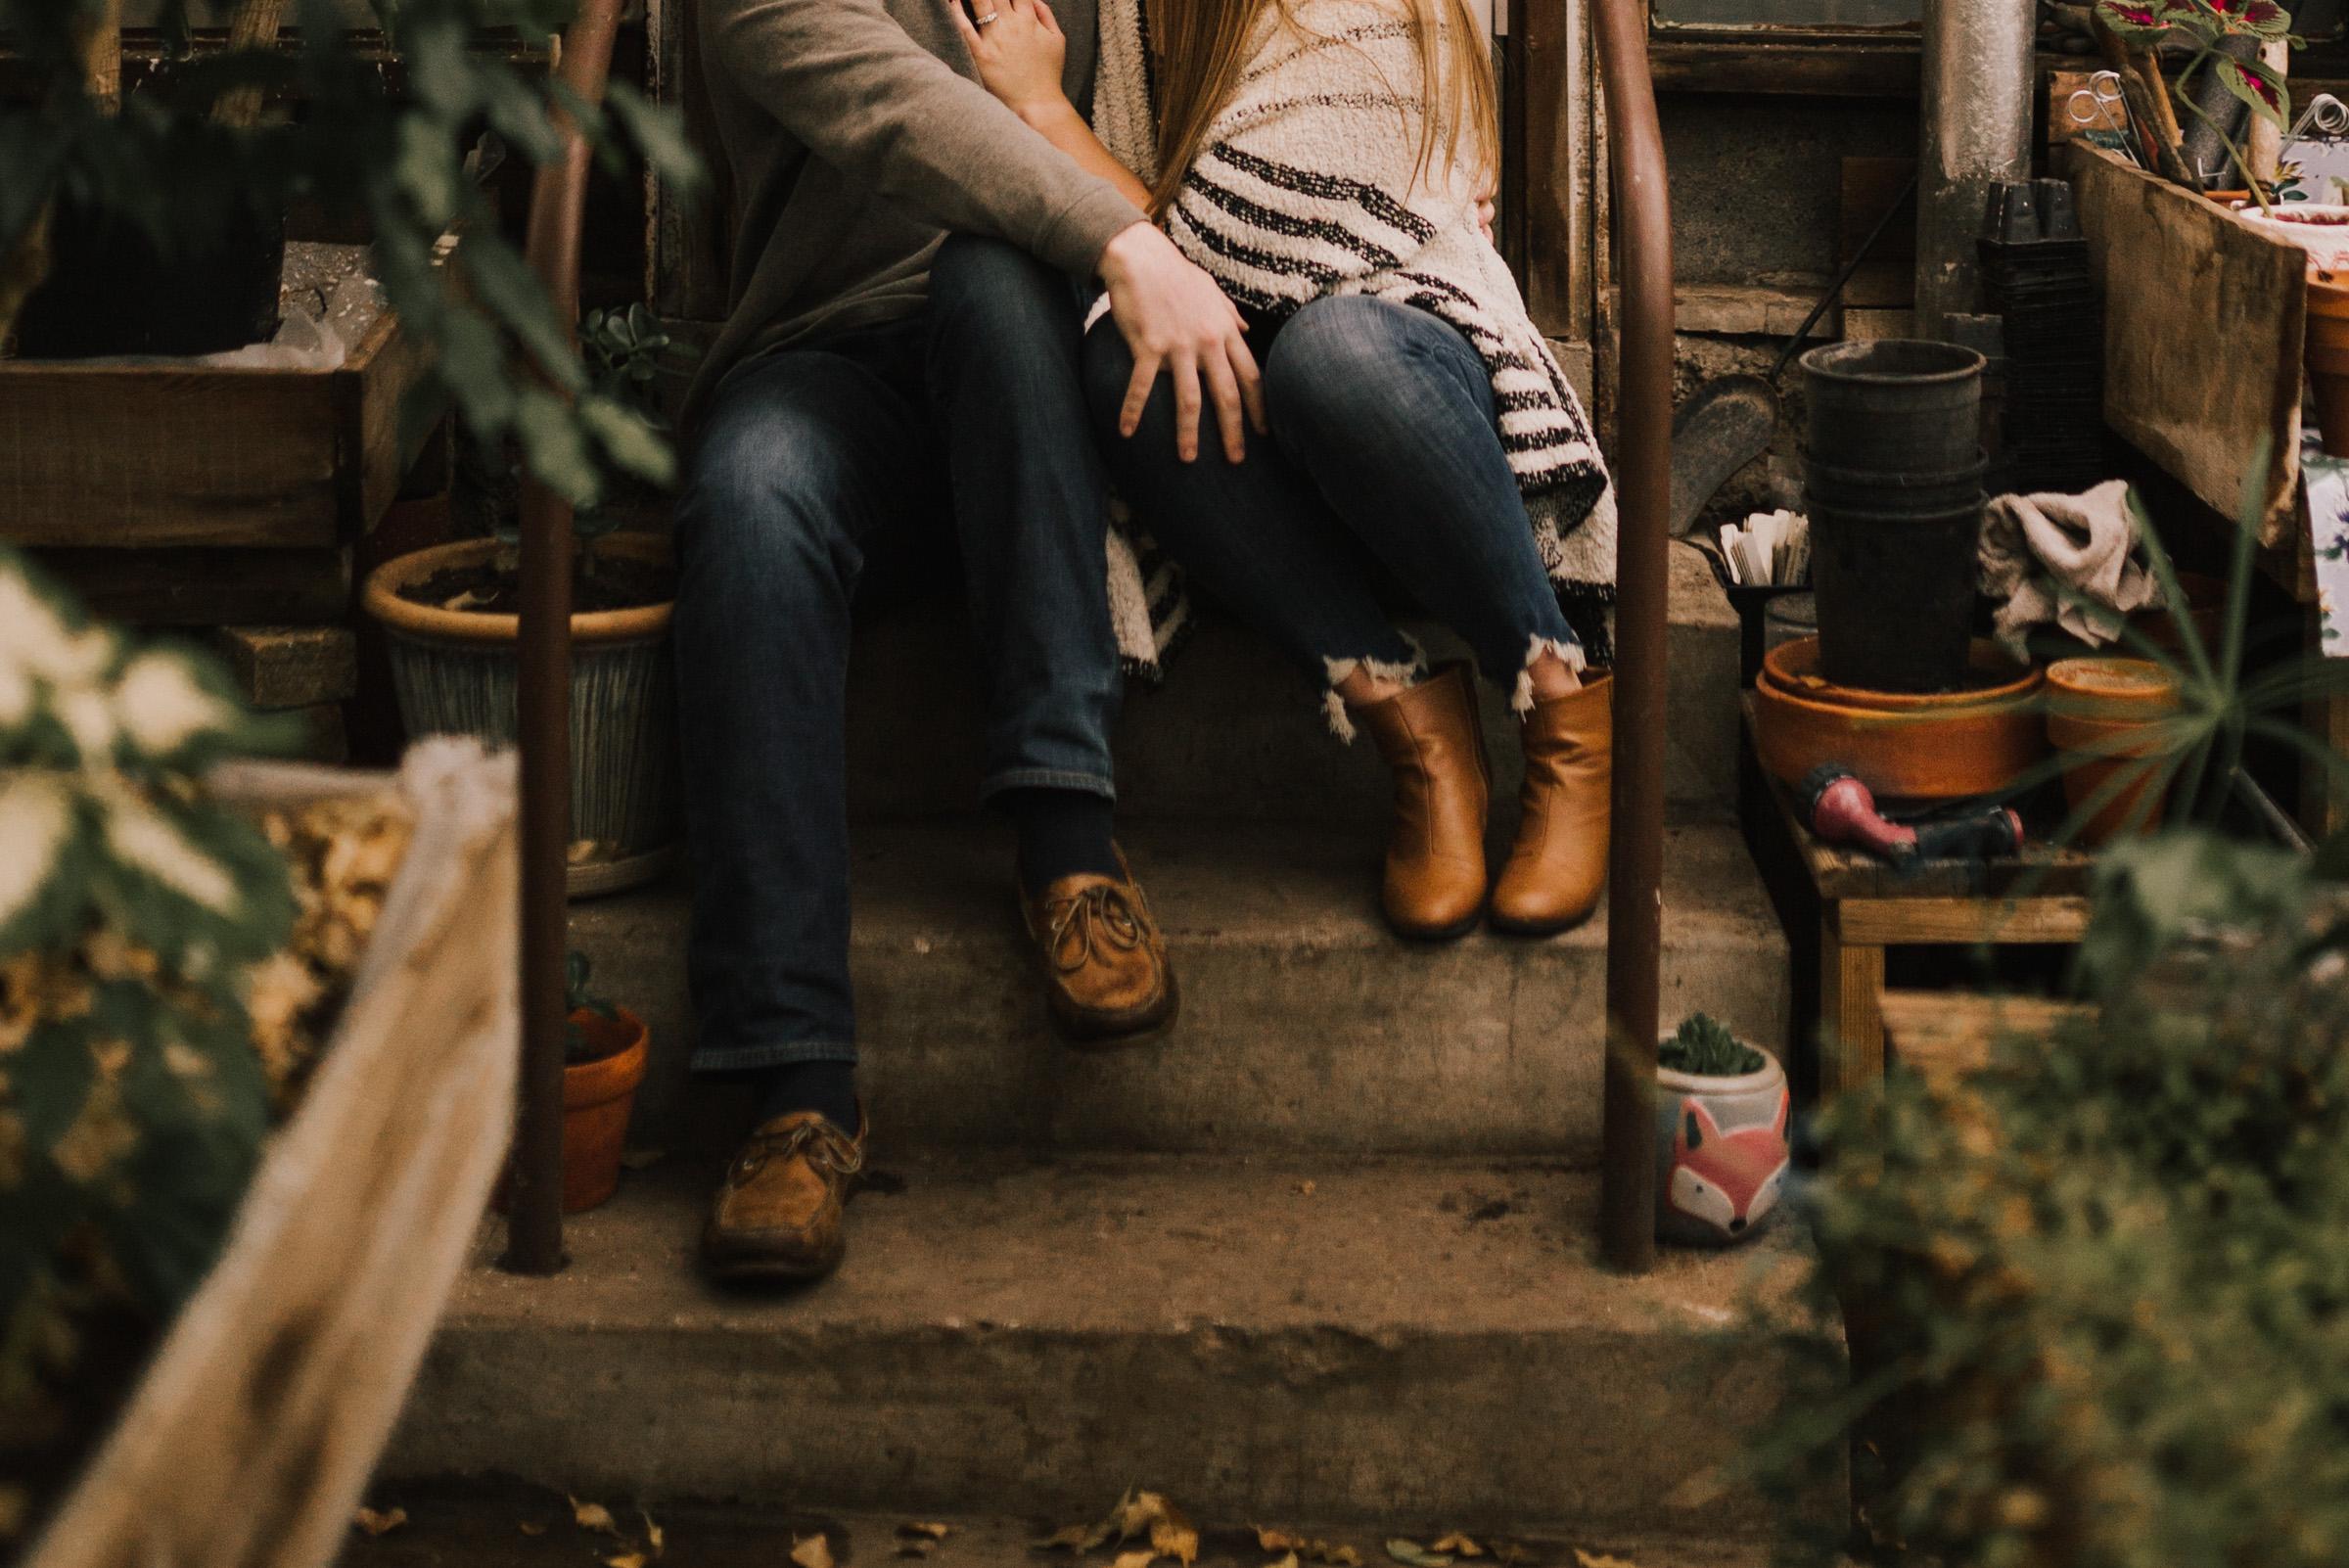 alyssa barletter photography johns greenhouse kansas city missouri brookside waldo engagement session winter-18.jpg